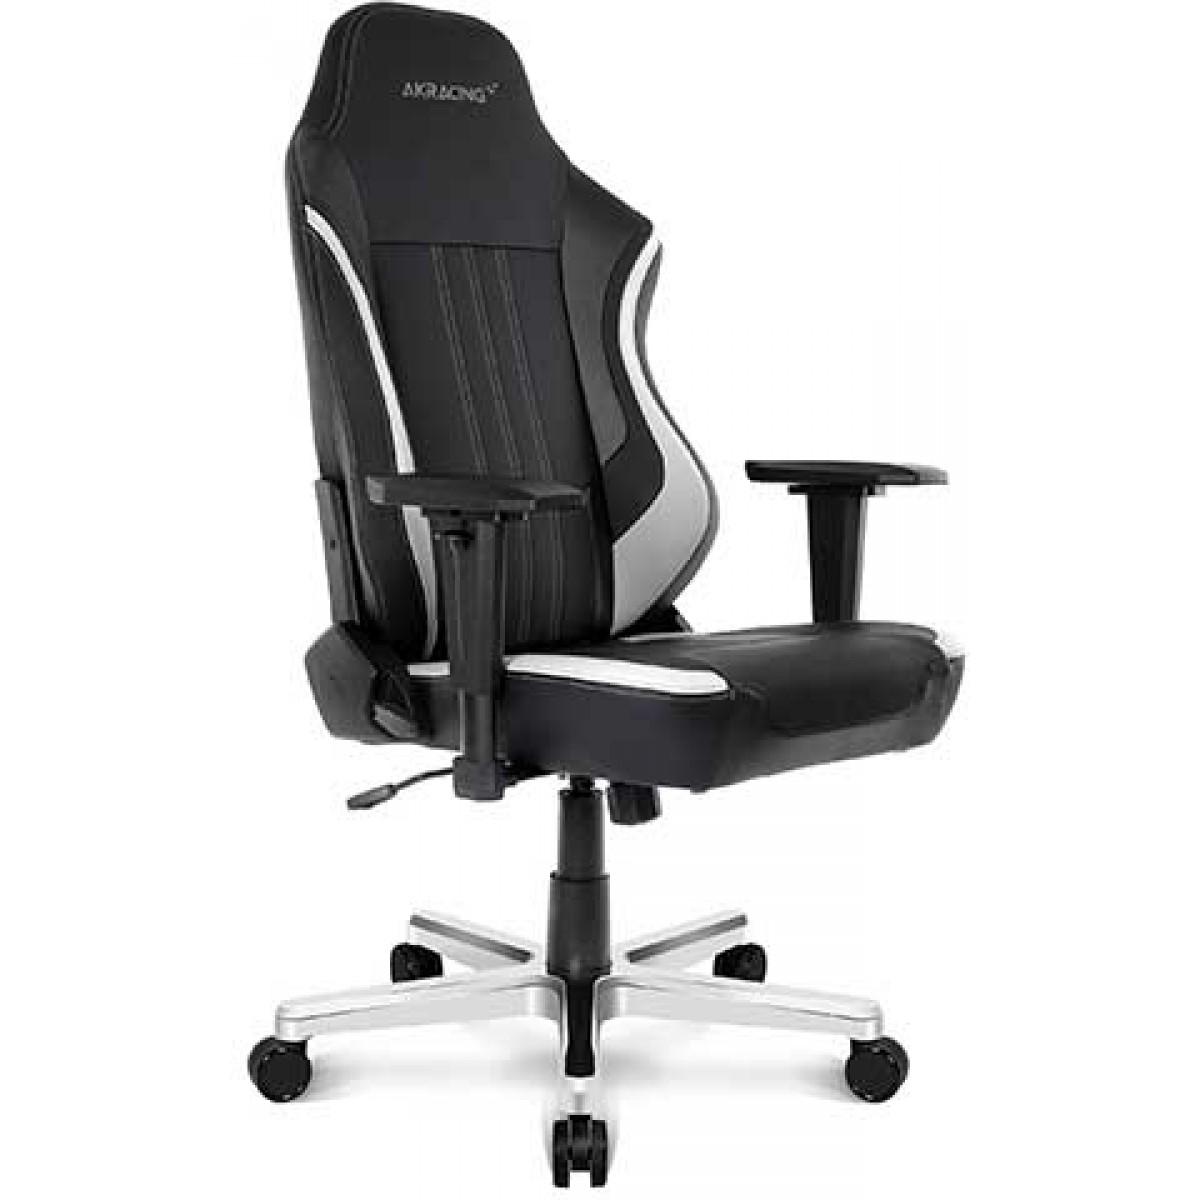 Cadeira Gamer AKRacing Solitude 11072-1 Branca